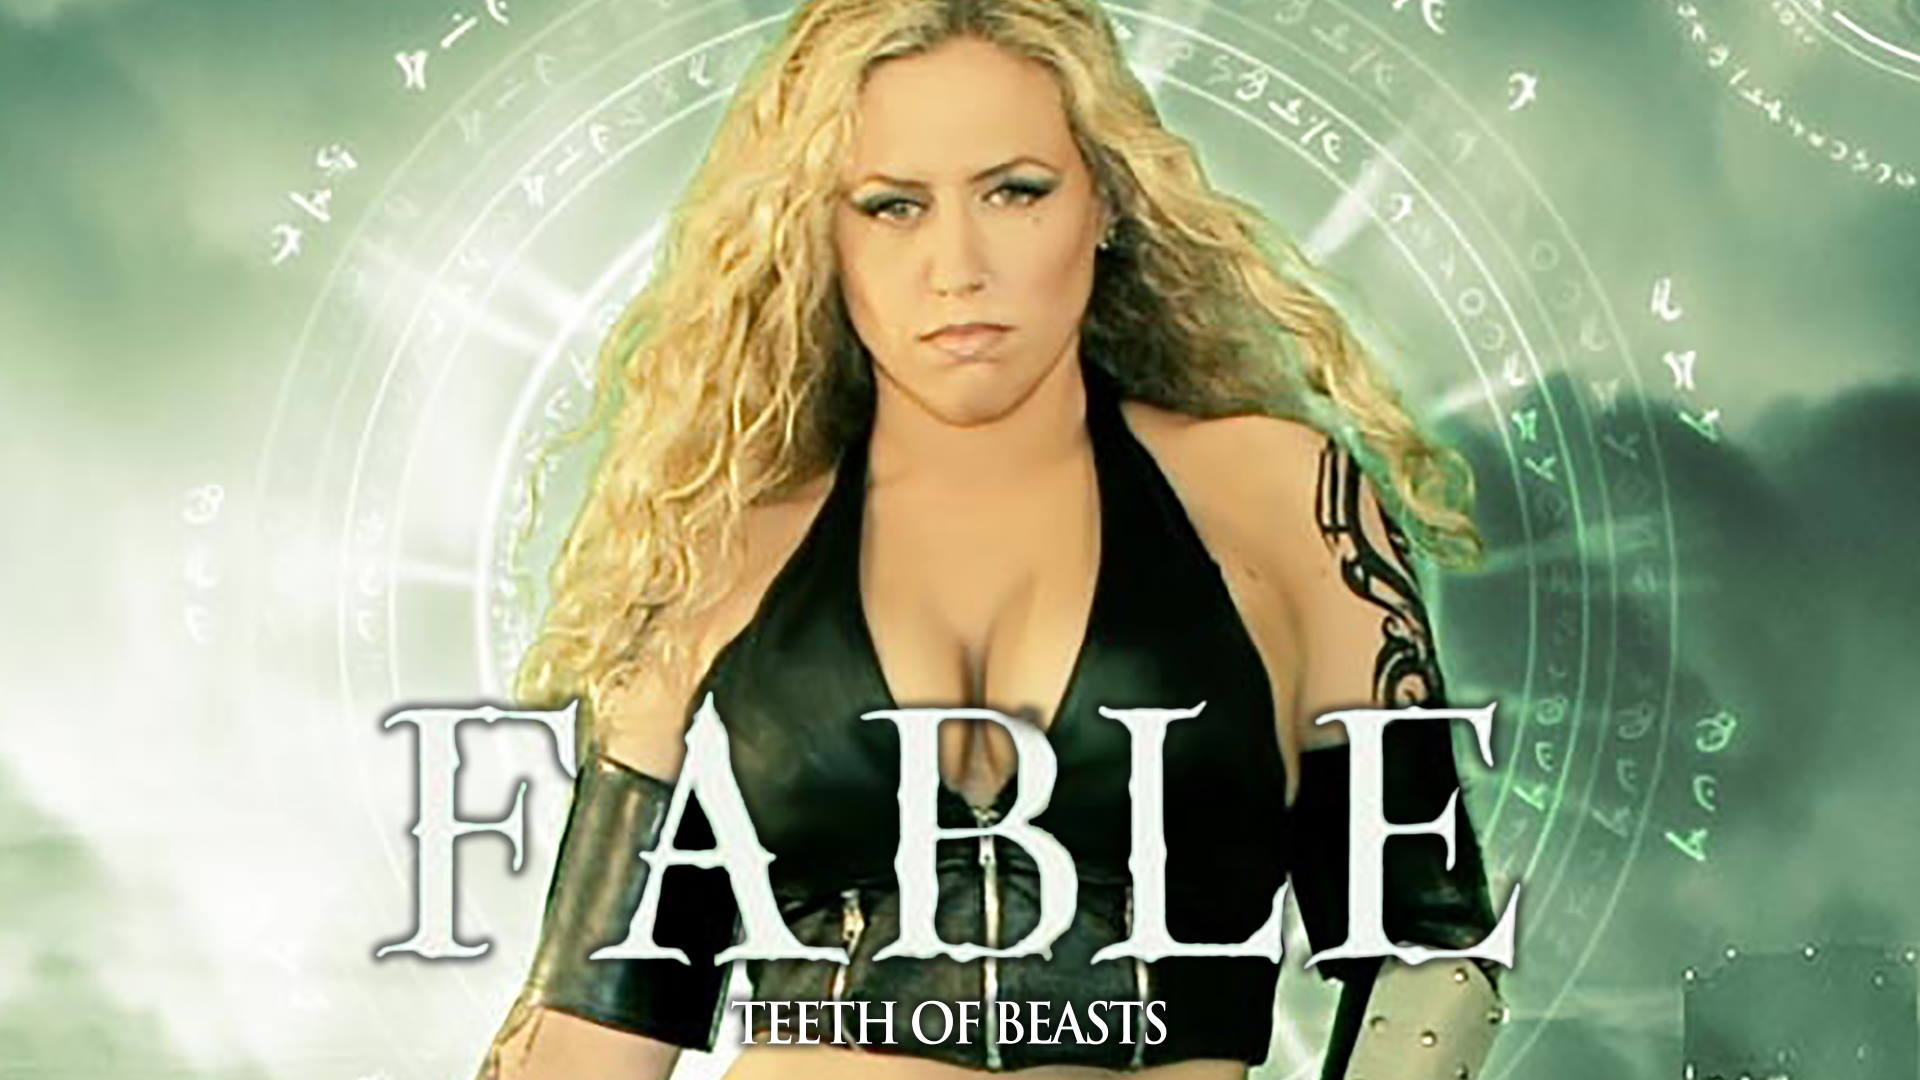 Fable: Teeth Of Beasts